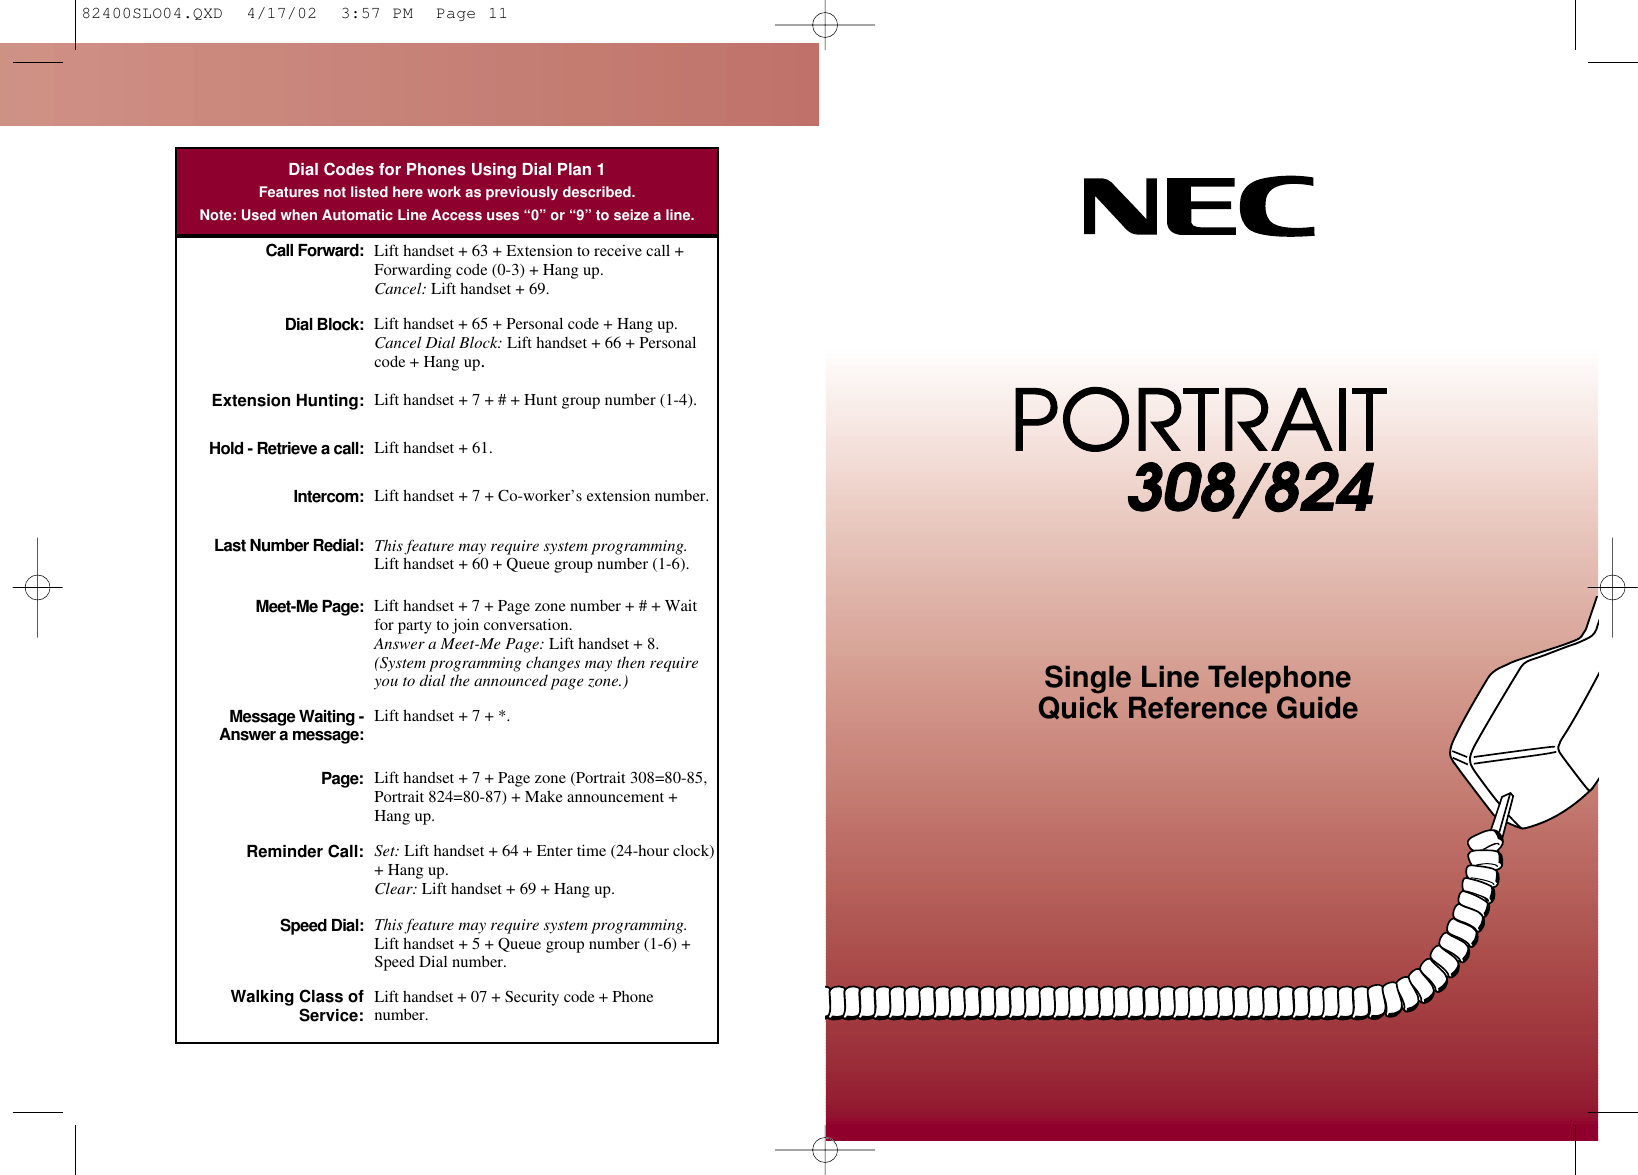 Nec 308 Users Manual 82400SLO04